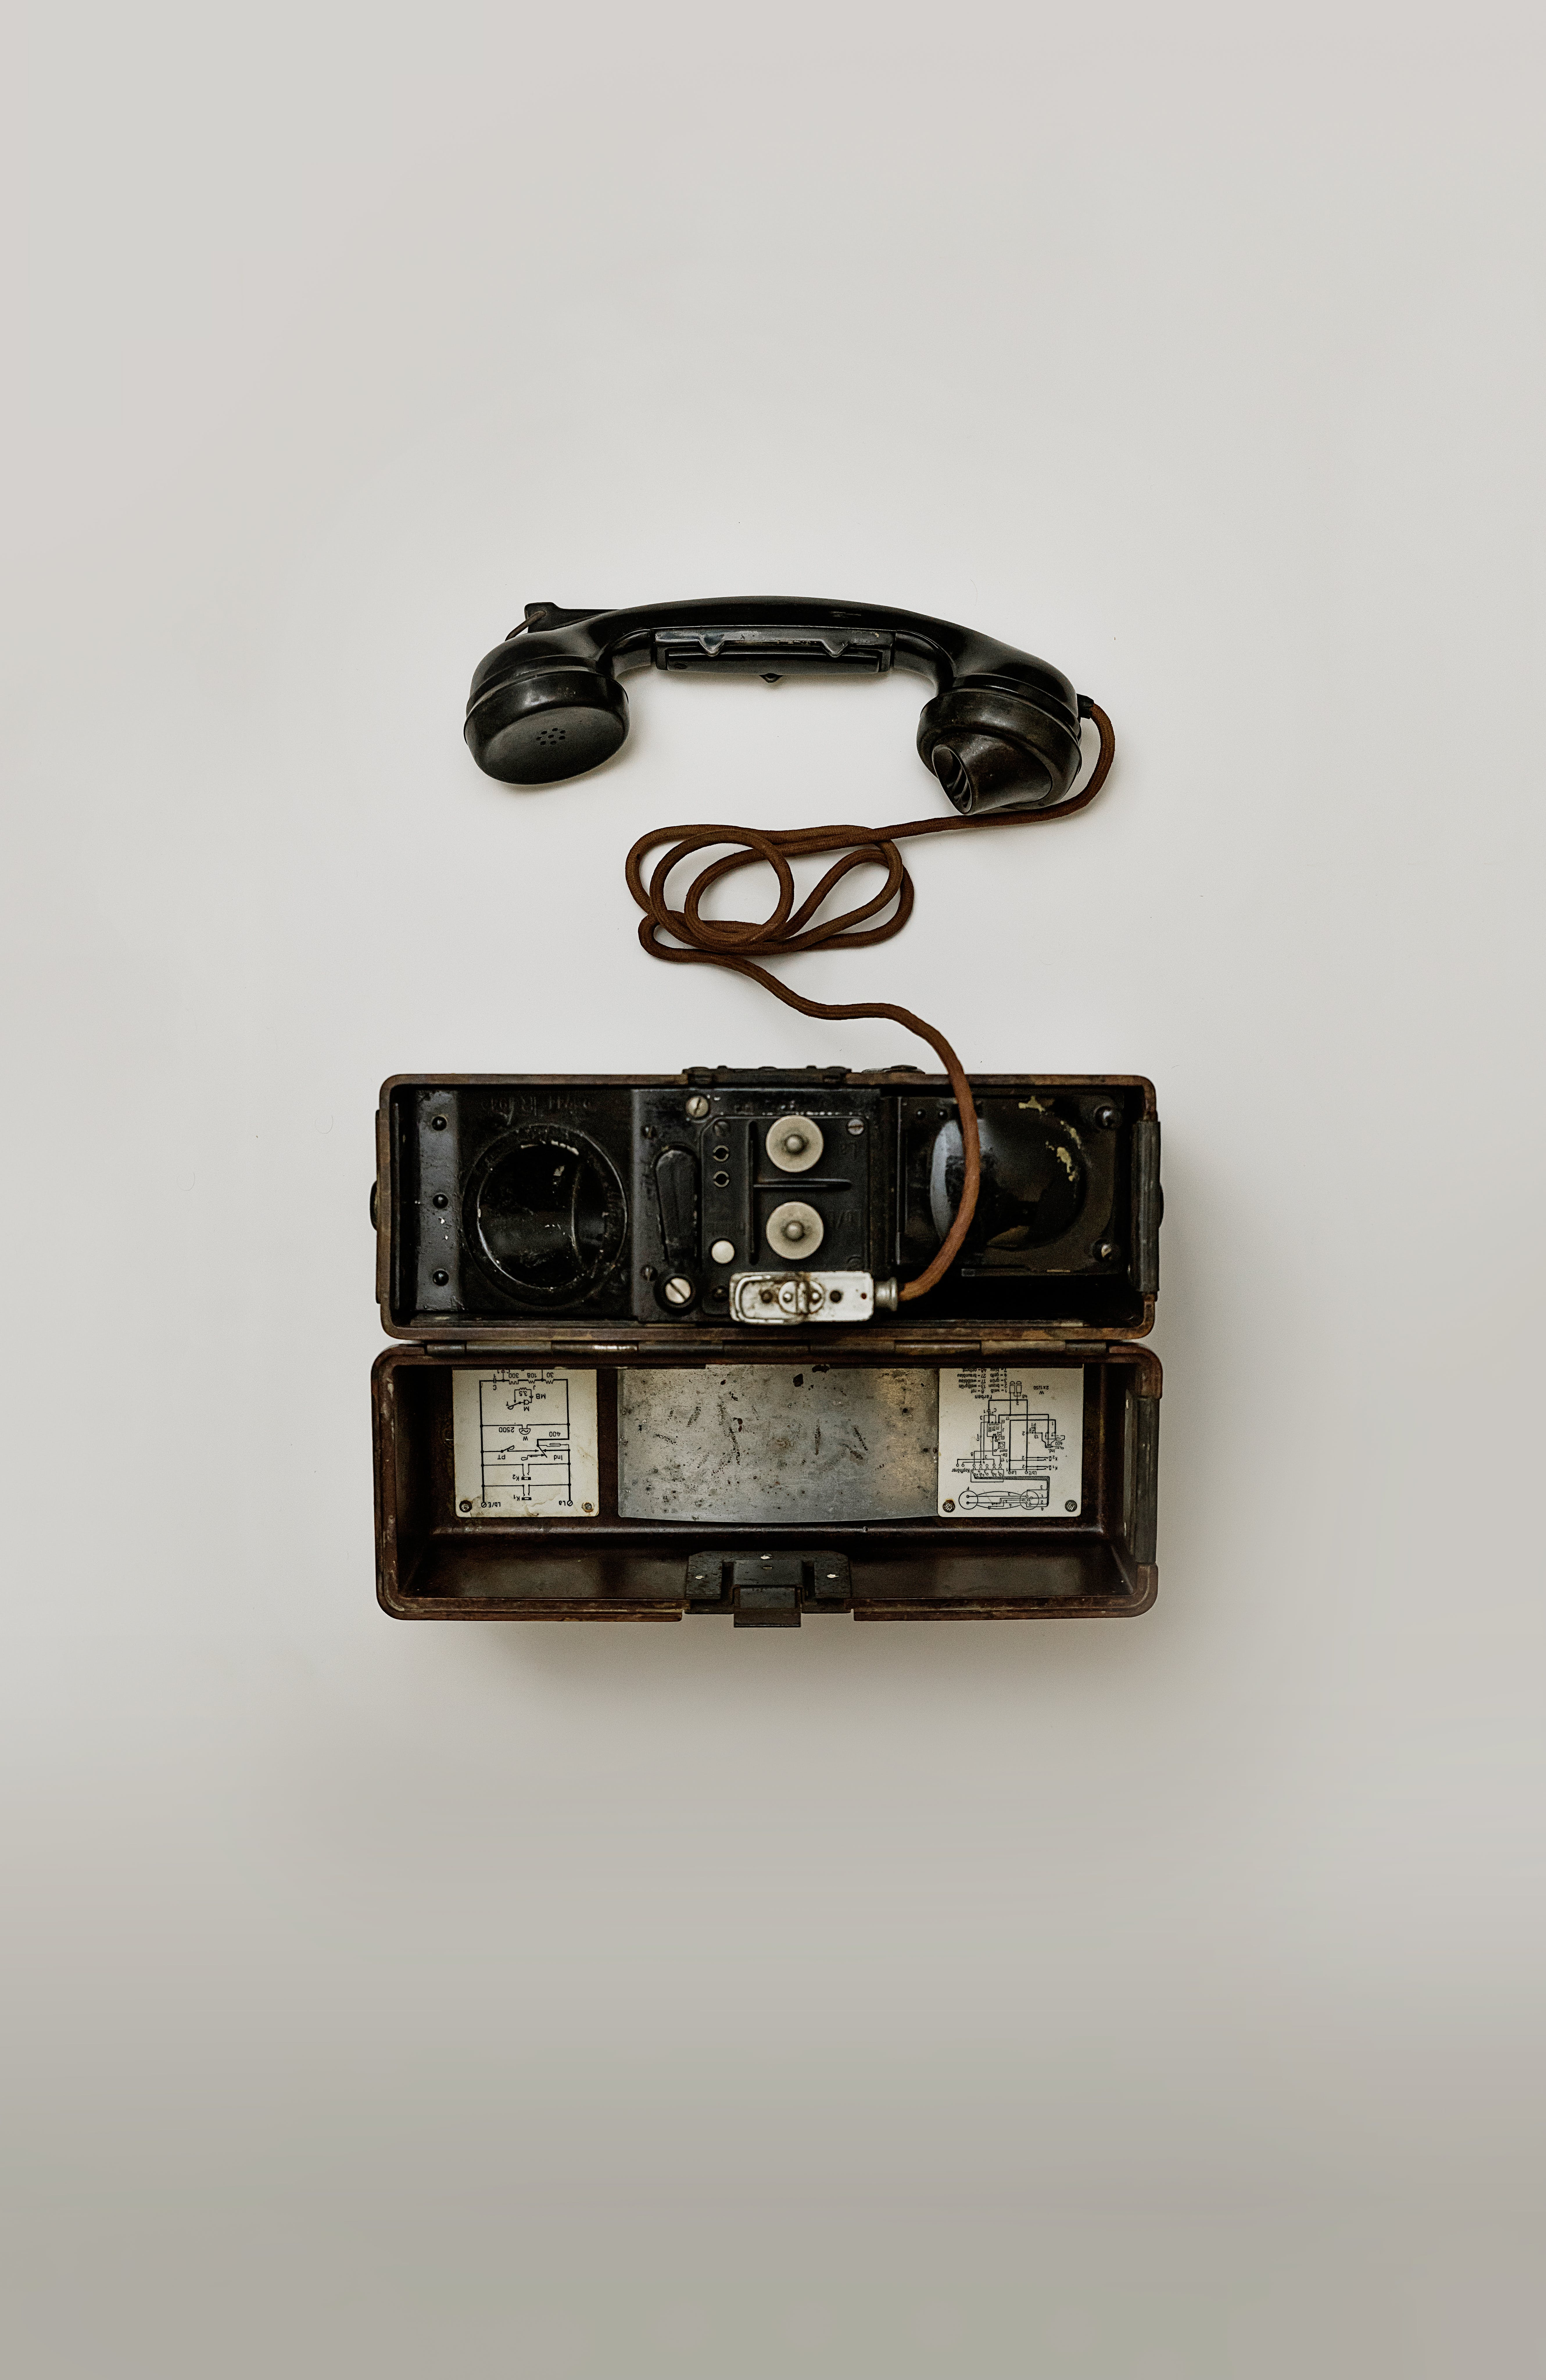 Black Telephone on White Surface